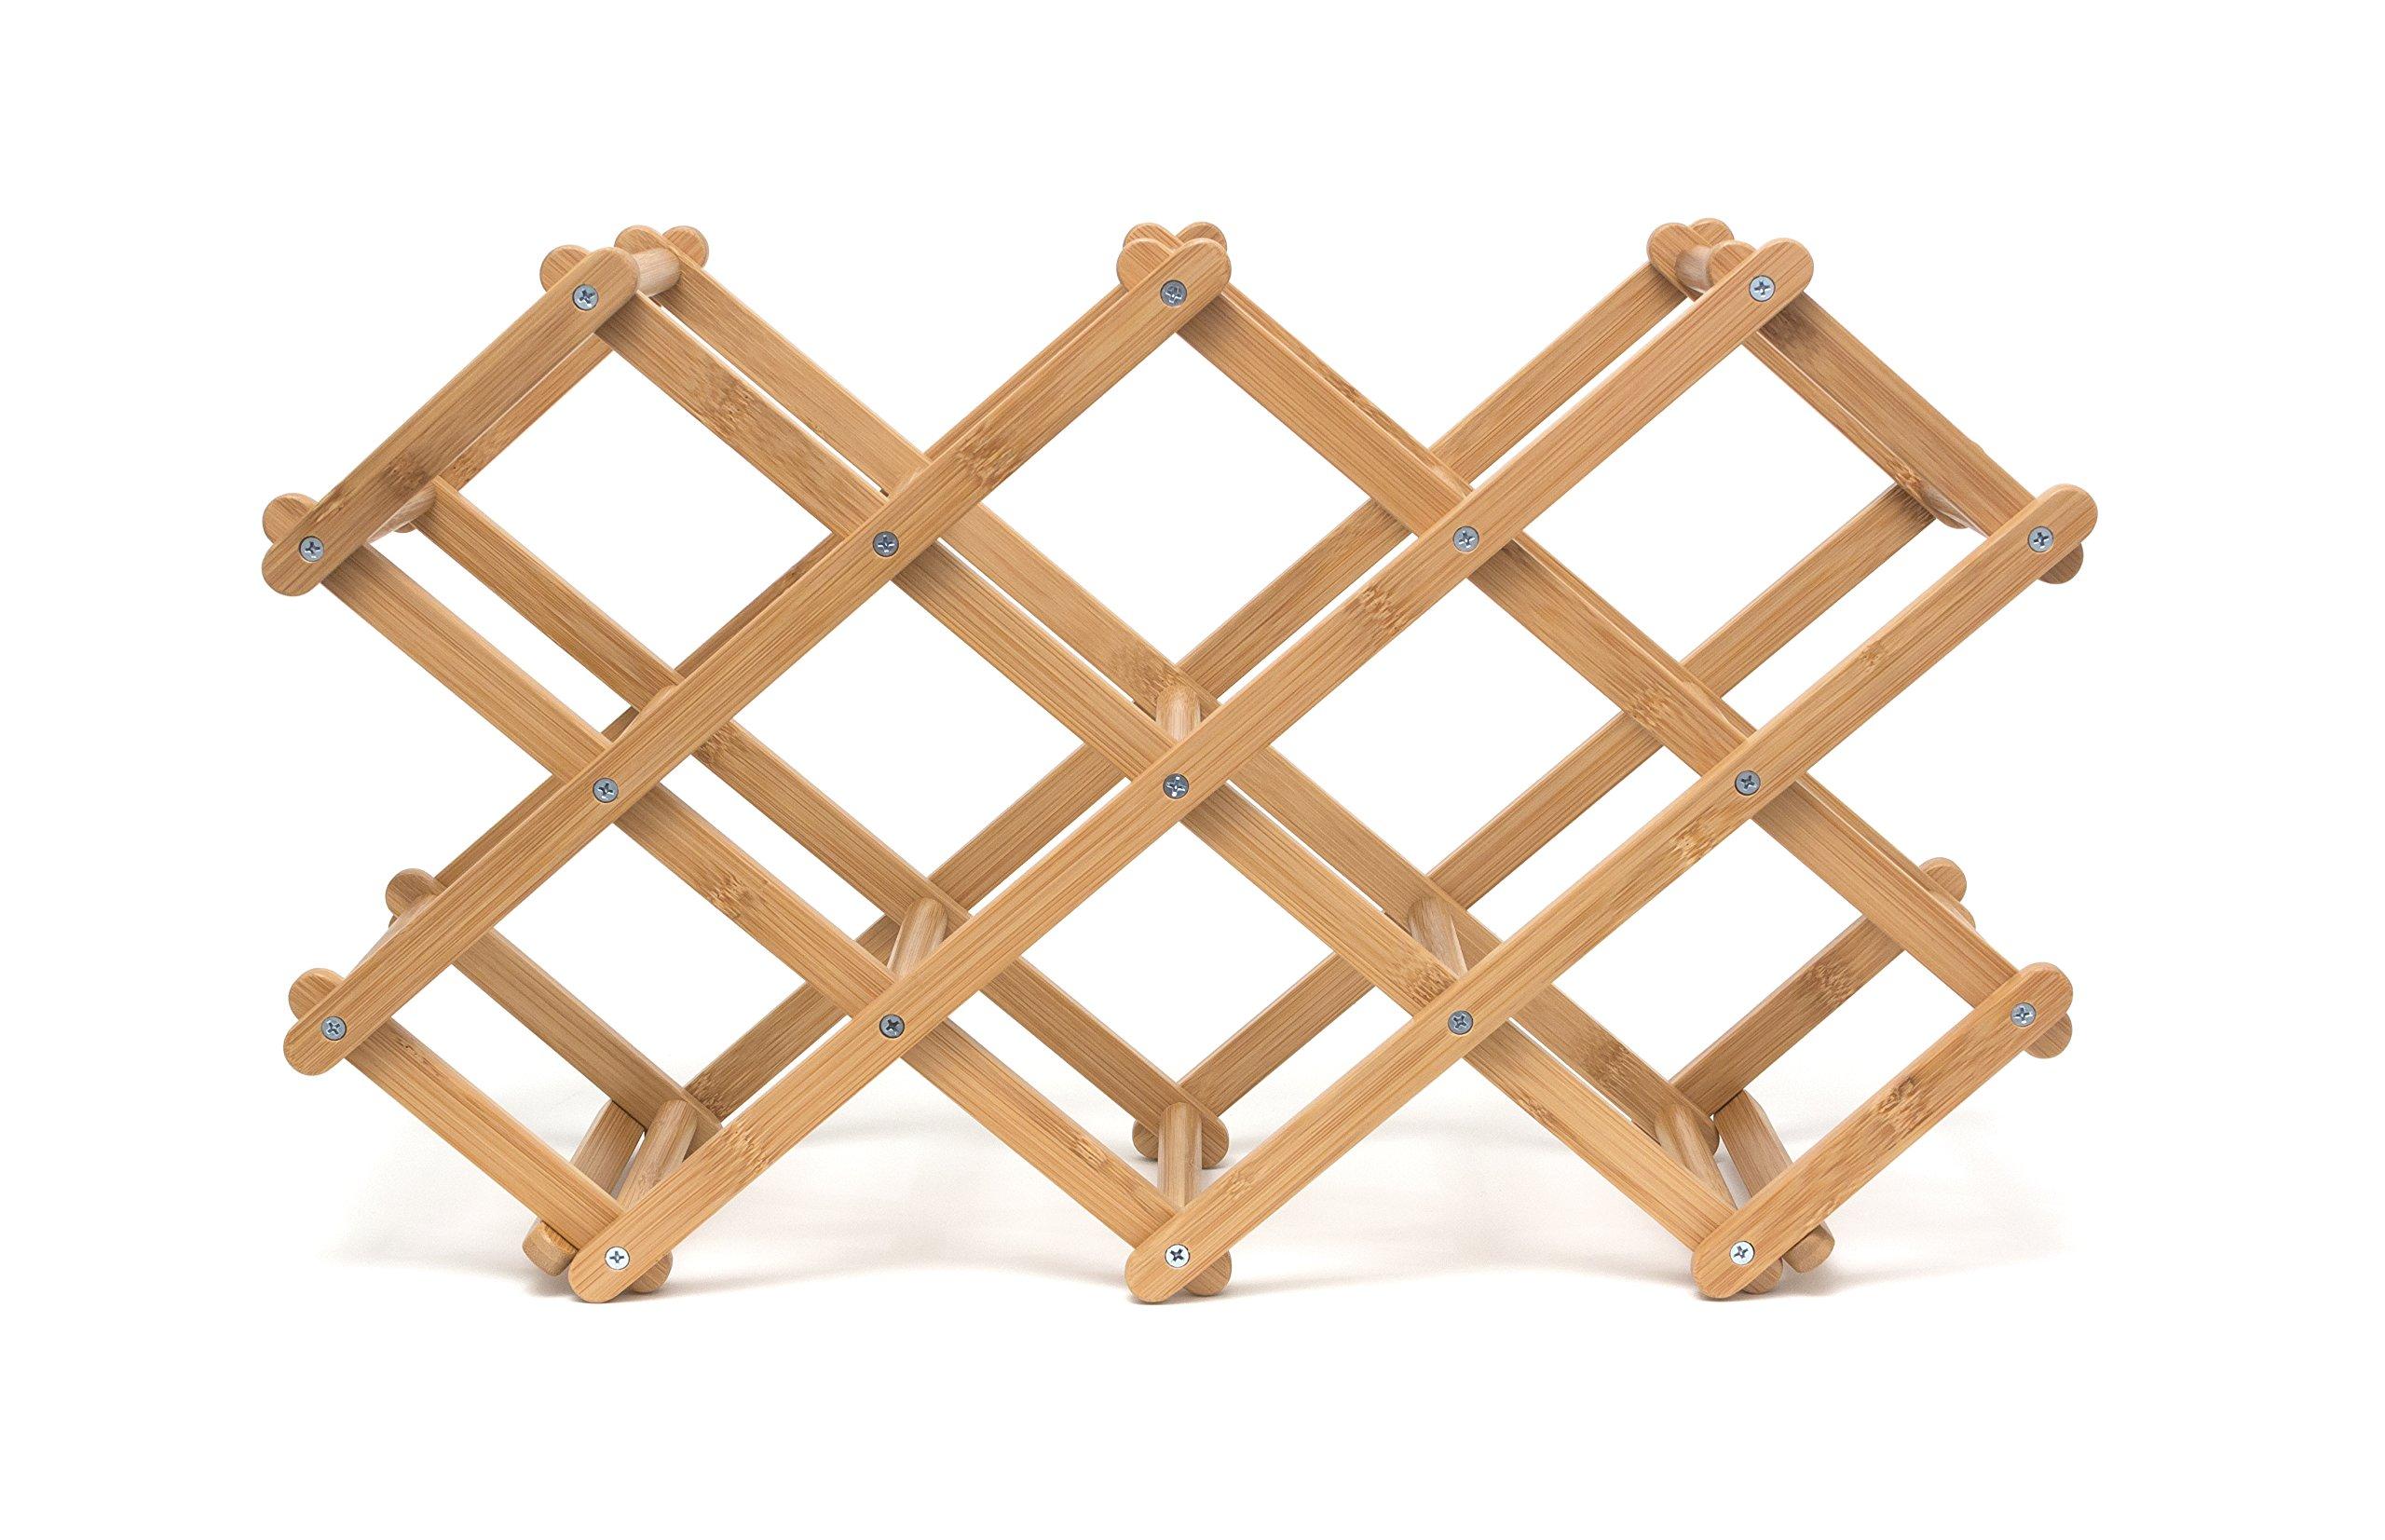 Lipper International 8314 Folding Bamboo Wood 10-Bottle Wine Rack, 19-5/8'' x 7-1/2'' x 3''